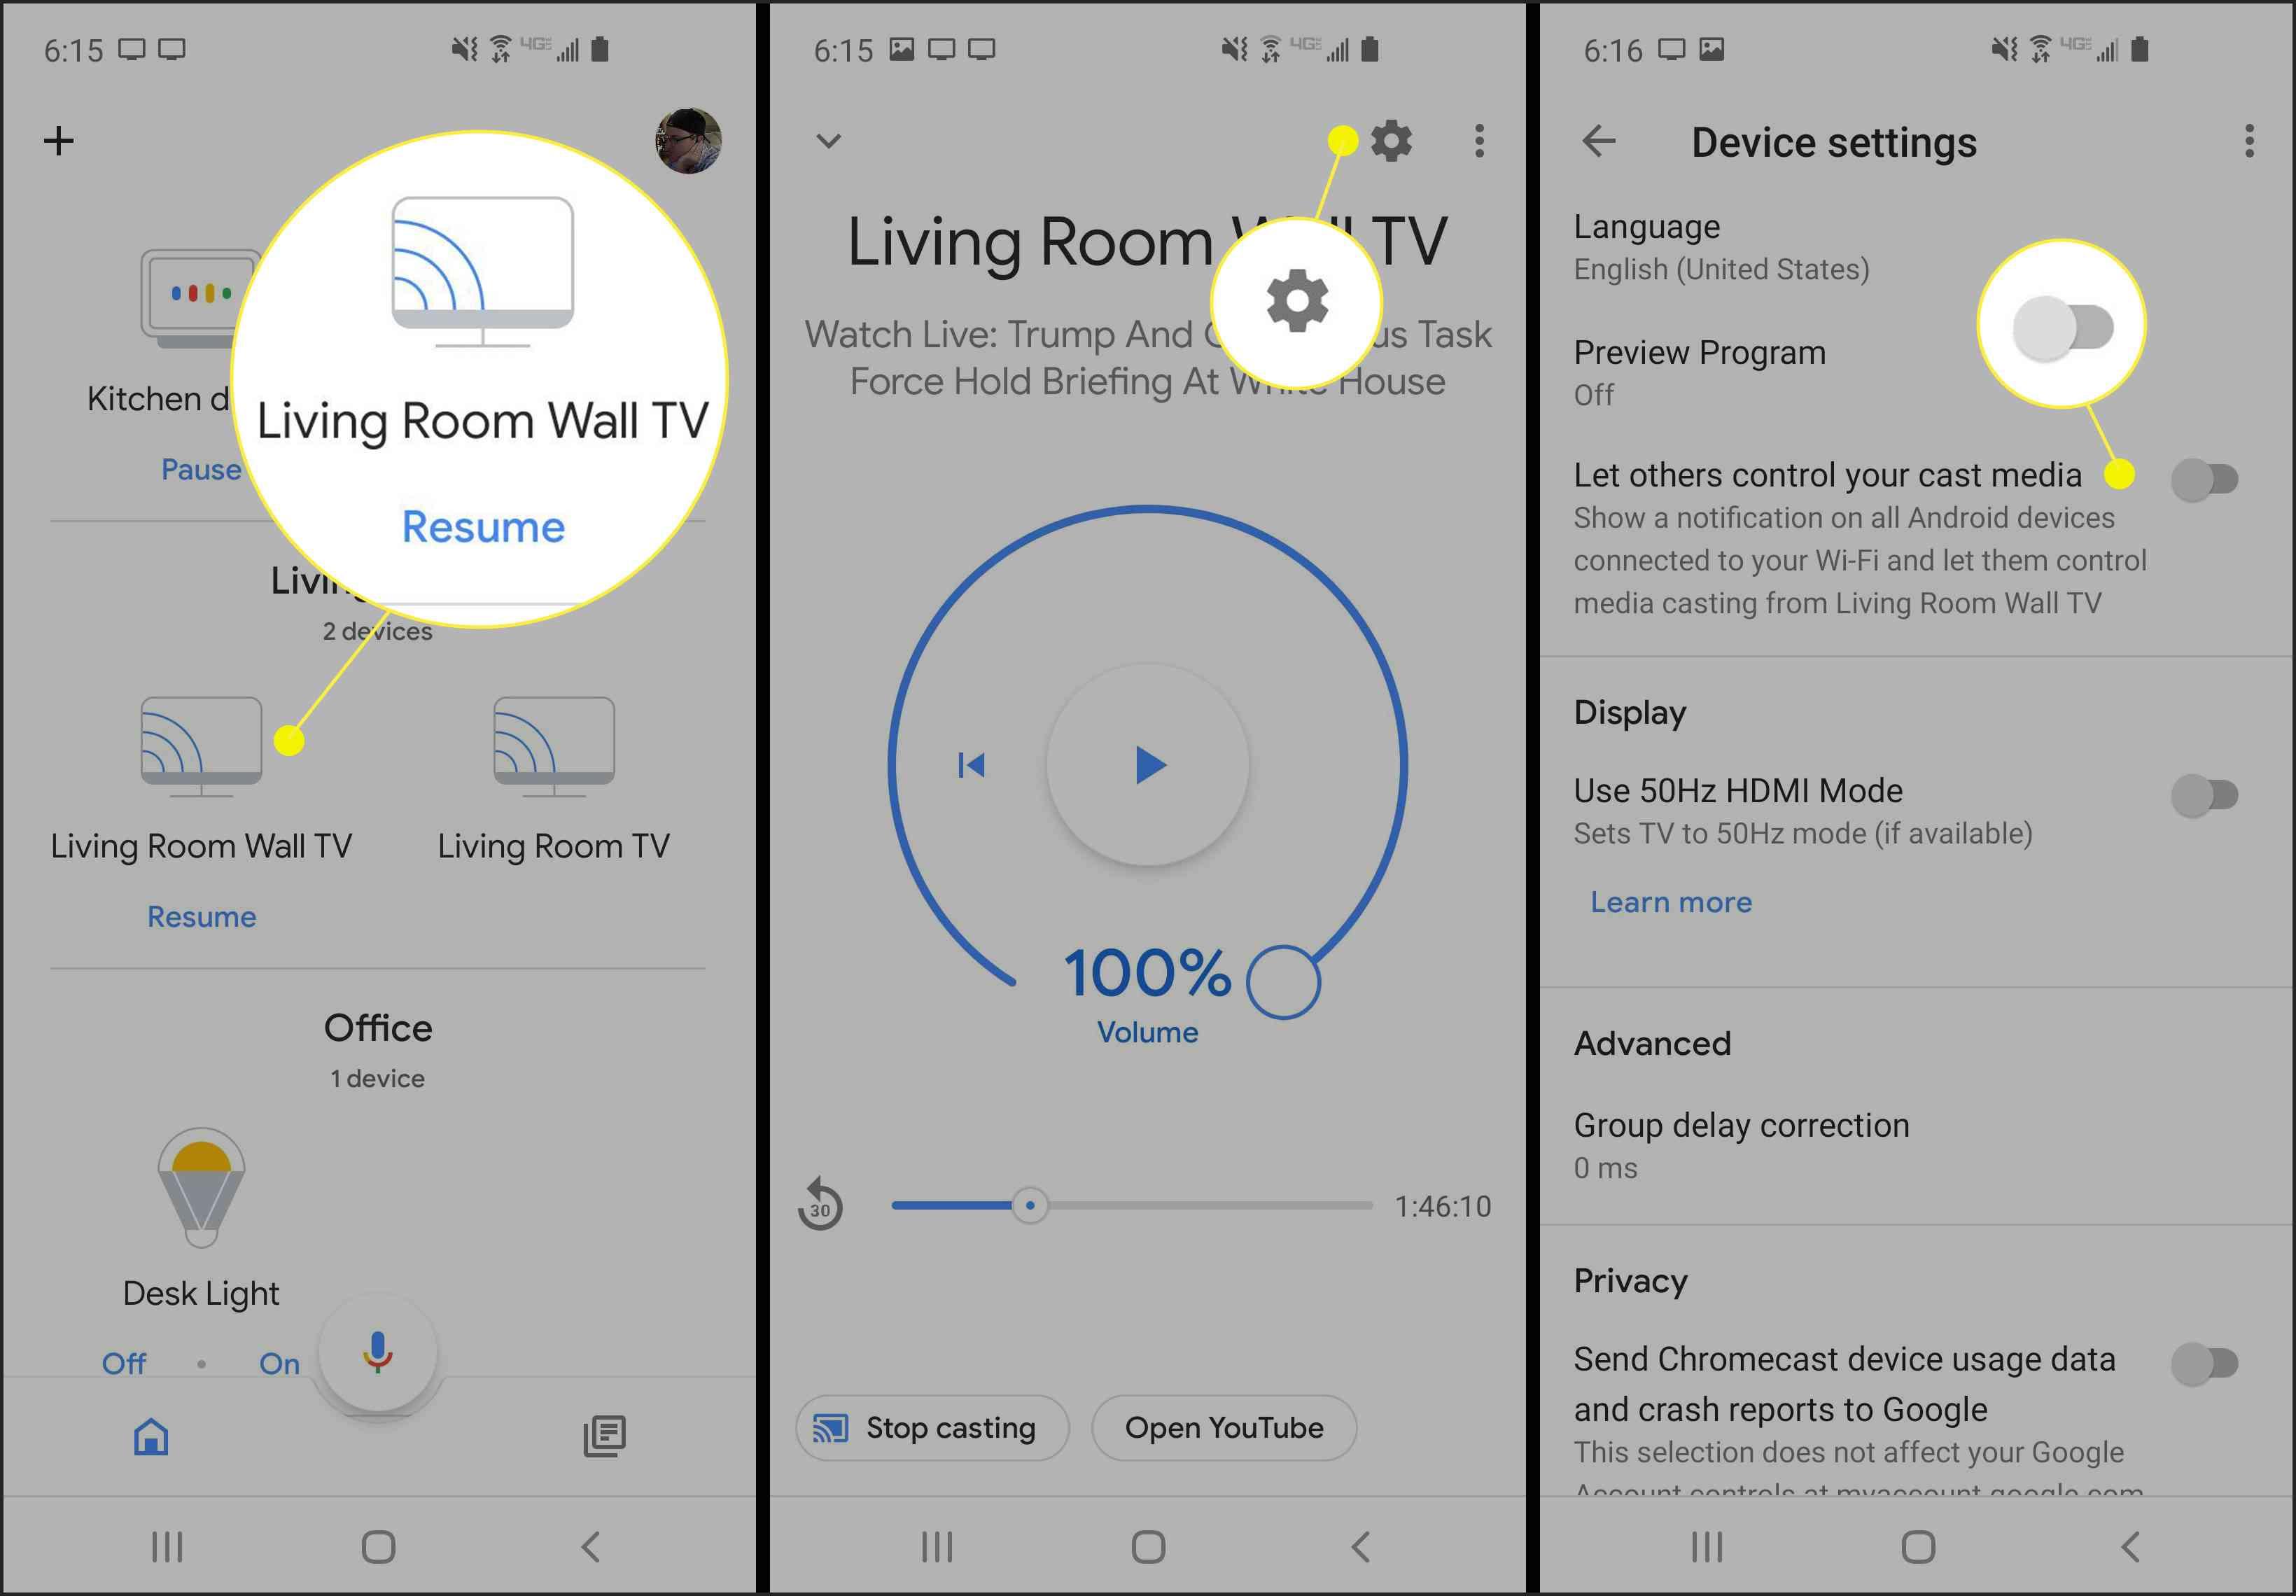 How To Turn Off Chromecast